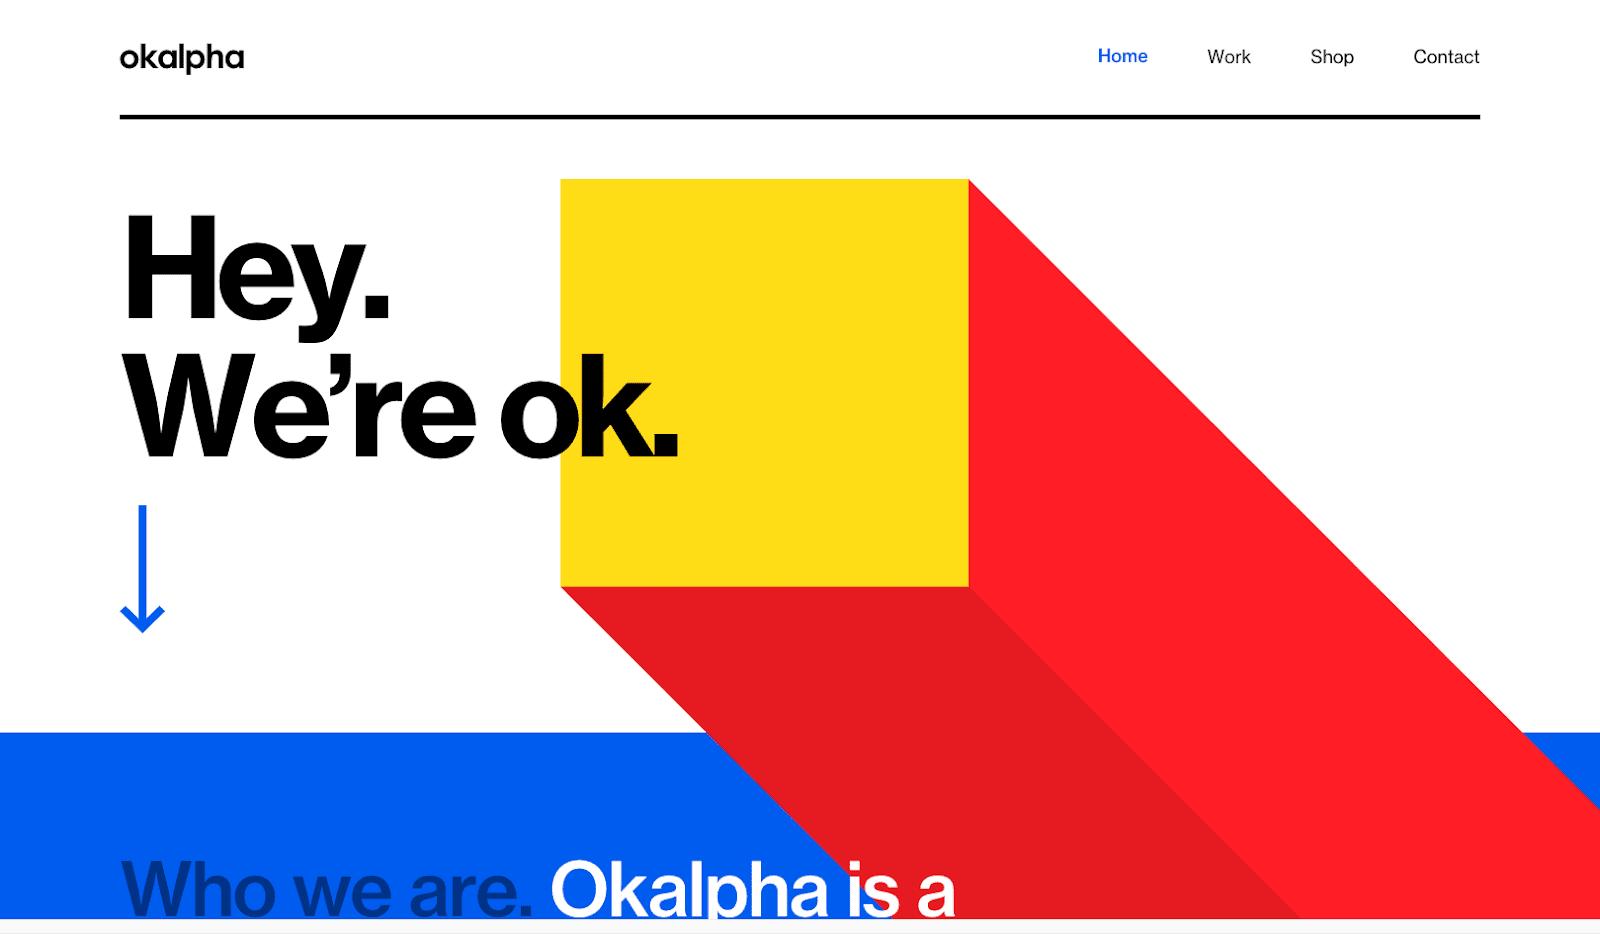 Okalpha